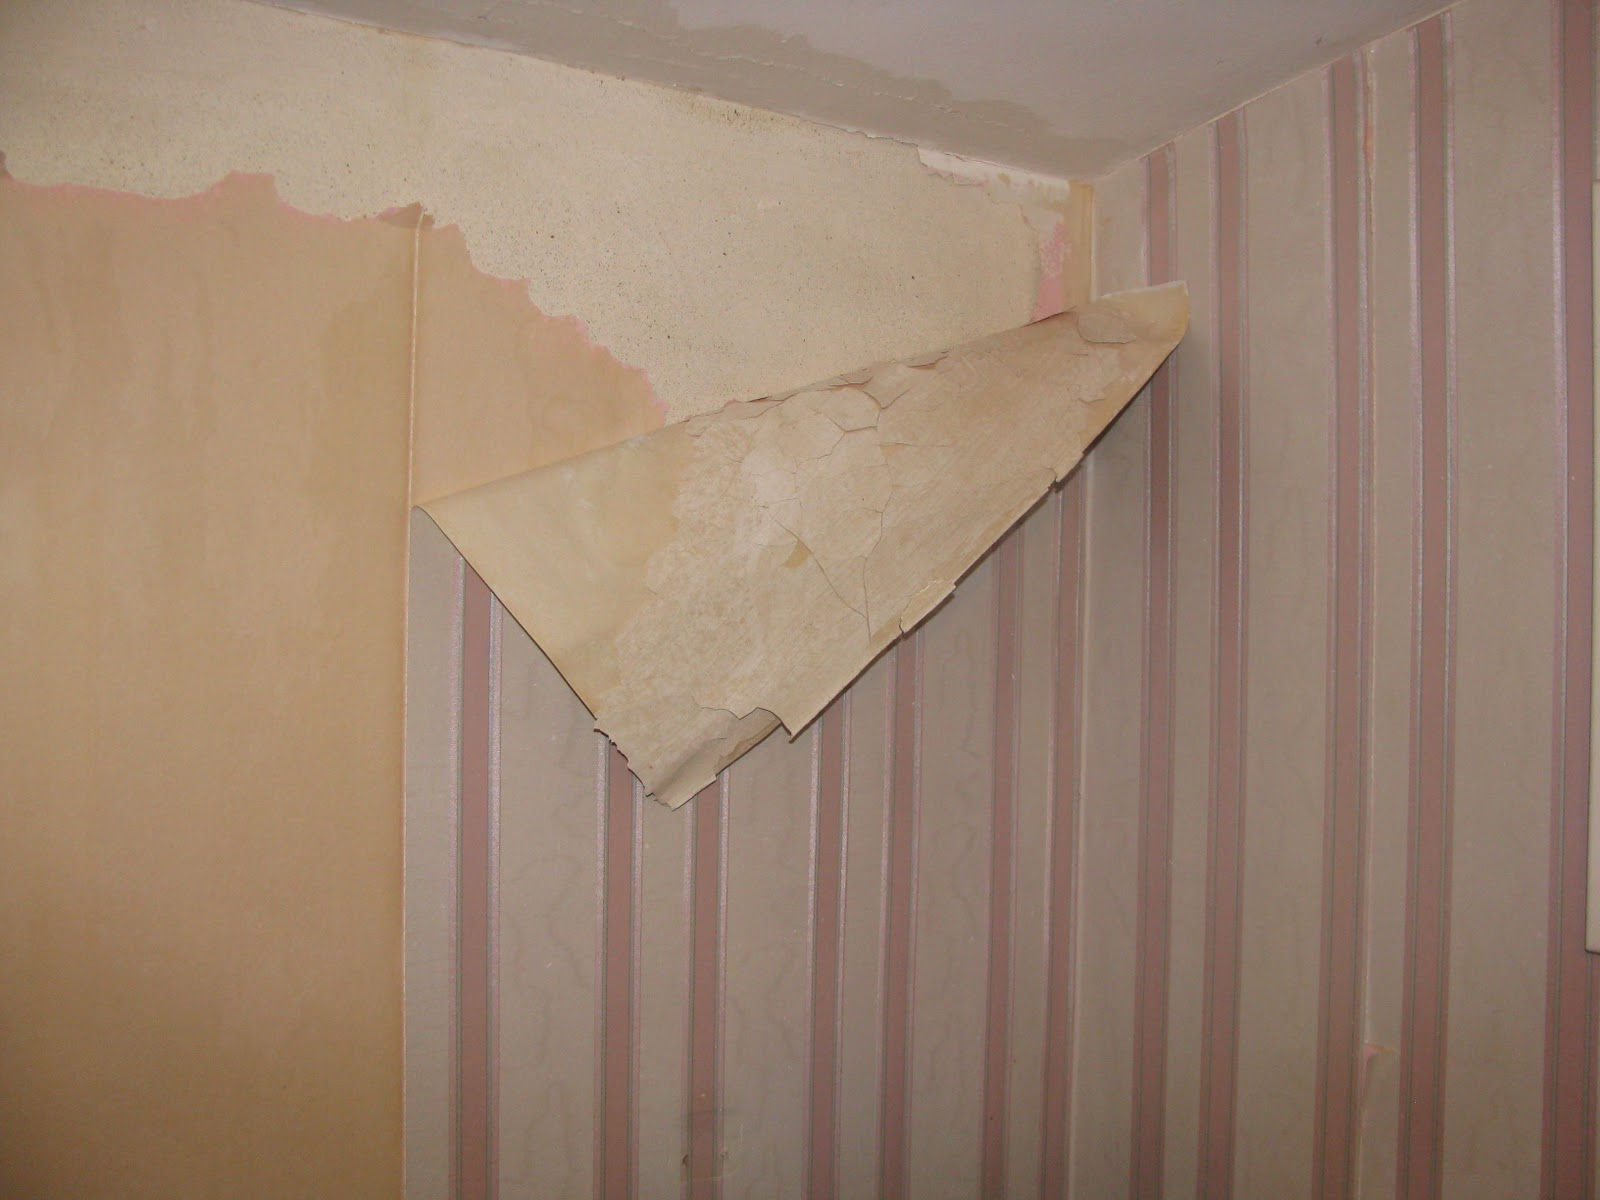 Peel Off Wallpaper 1600x1200